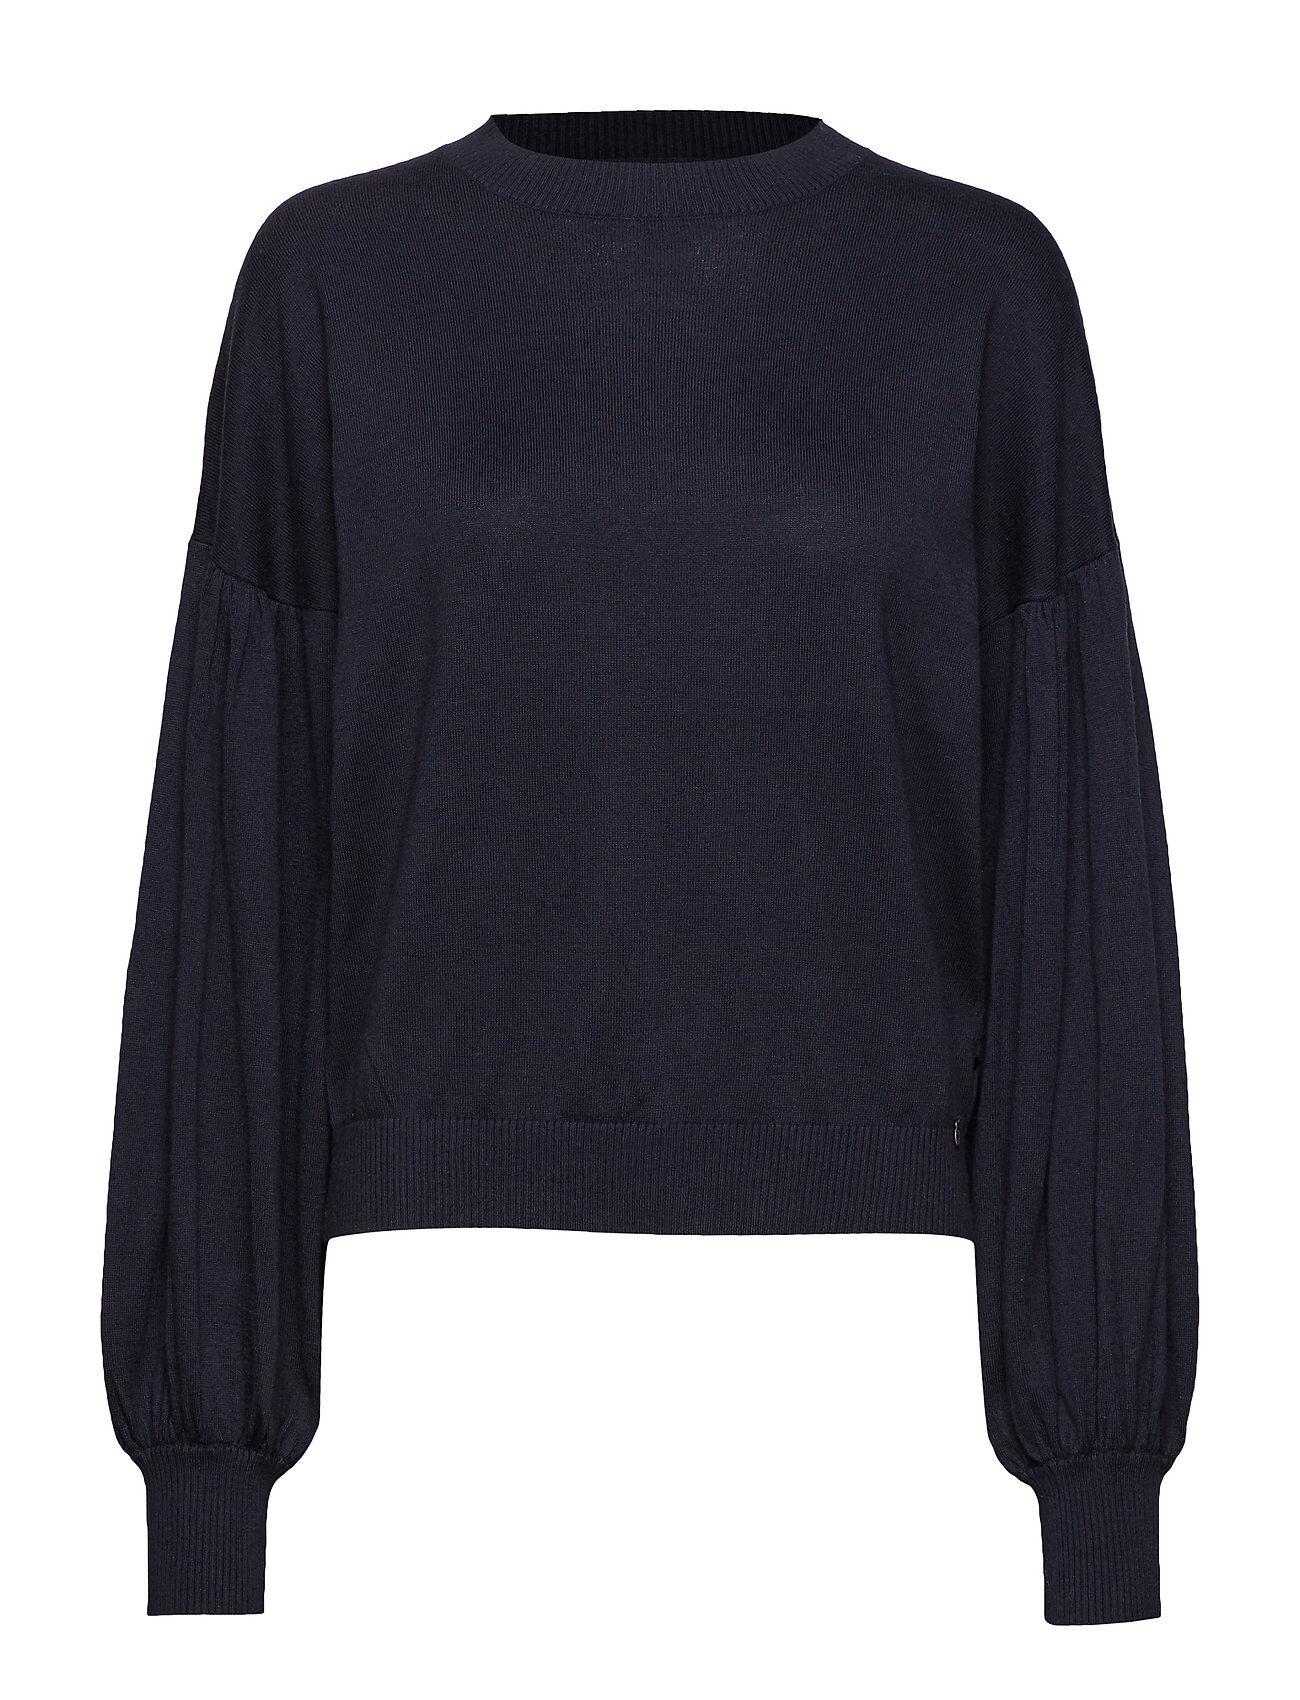 Twist & Tango Beatrice Sweater Blackish Blue